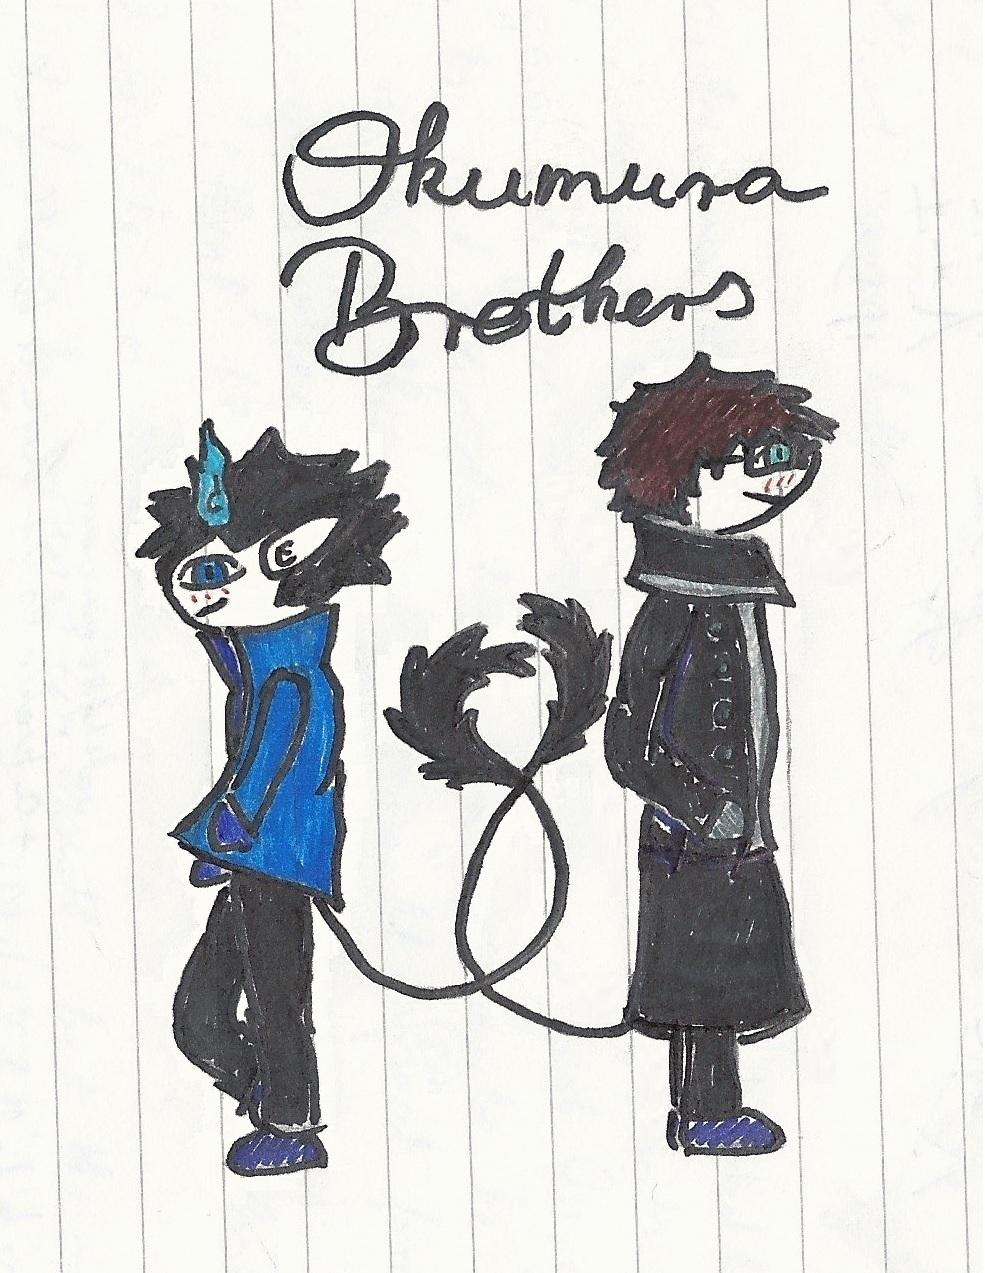 Okumura Brothers 3 by Lunajanka